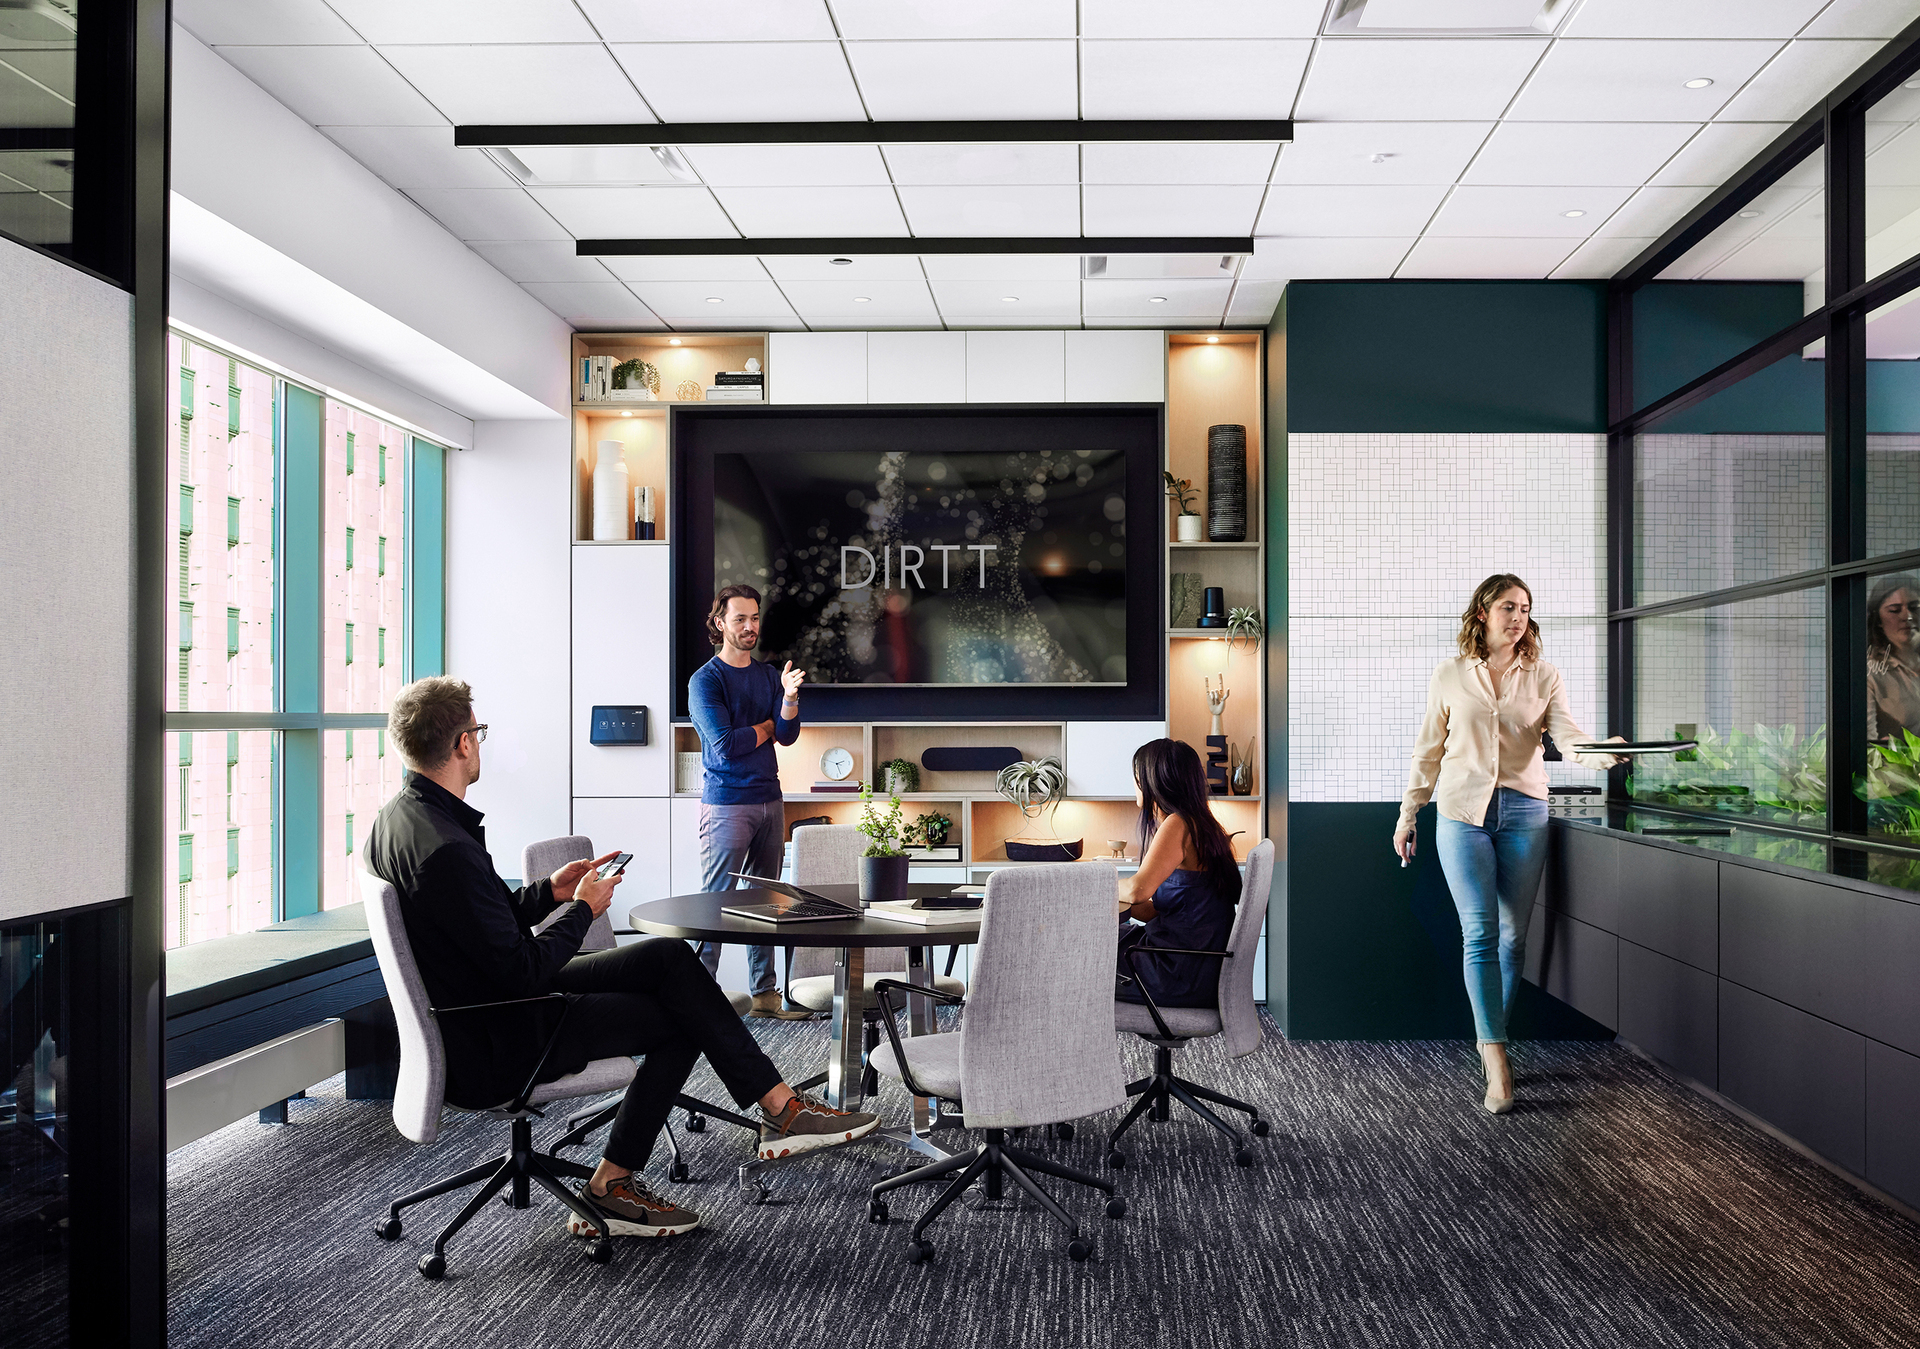 Chicago DIRTT Experience Center photo showing a meeting room built using DIRTT custom modular interior solutions.